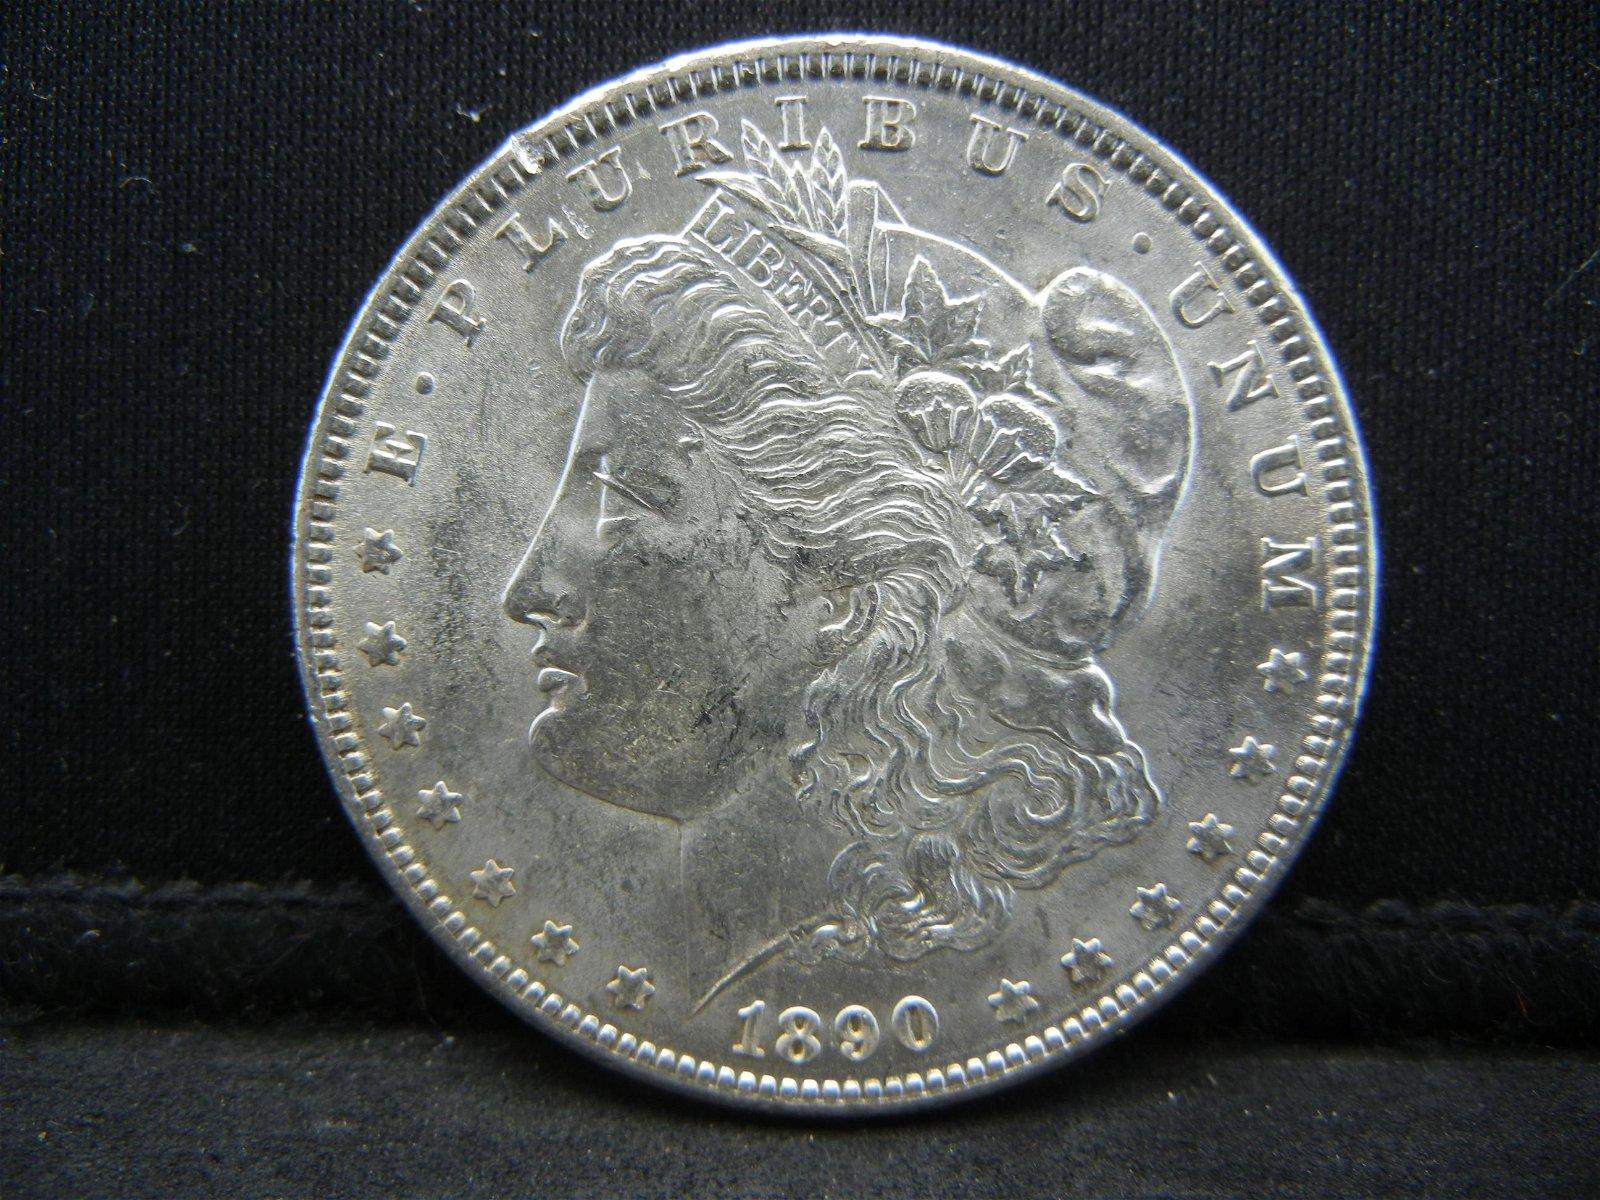 1890 Morgan Dollar Strong Details